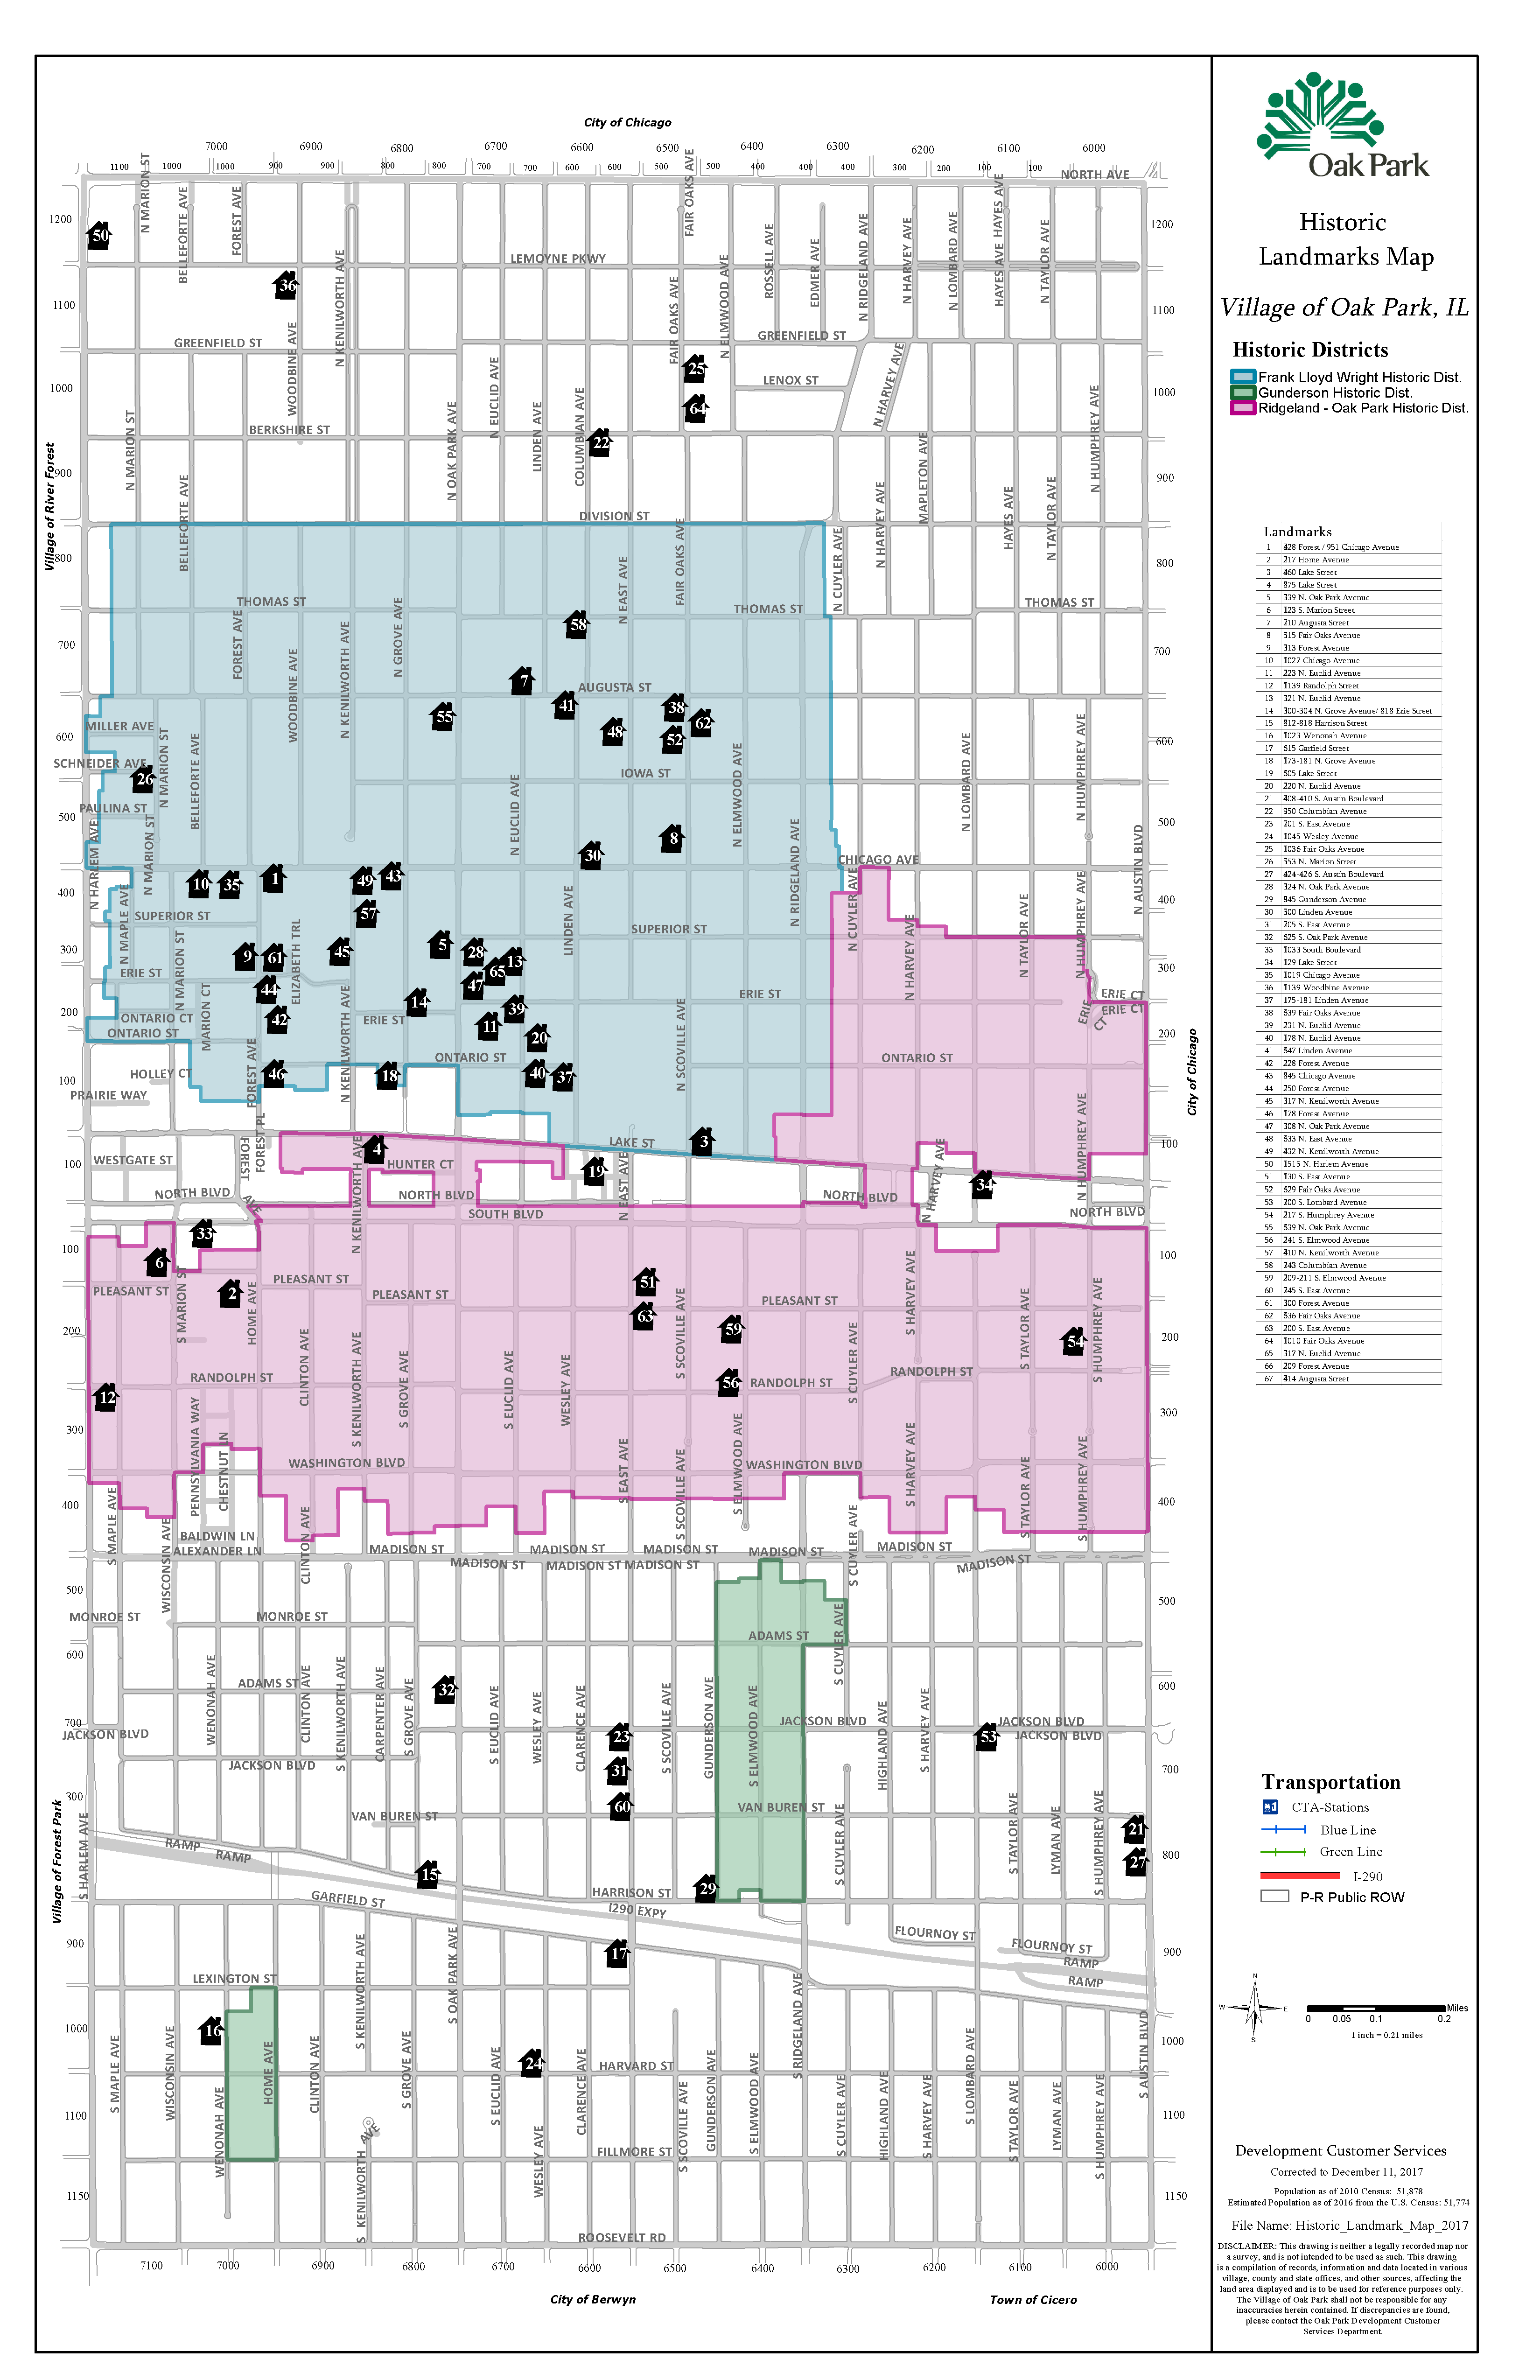 historic district boundaries